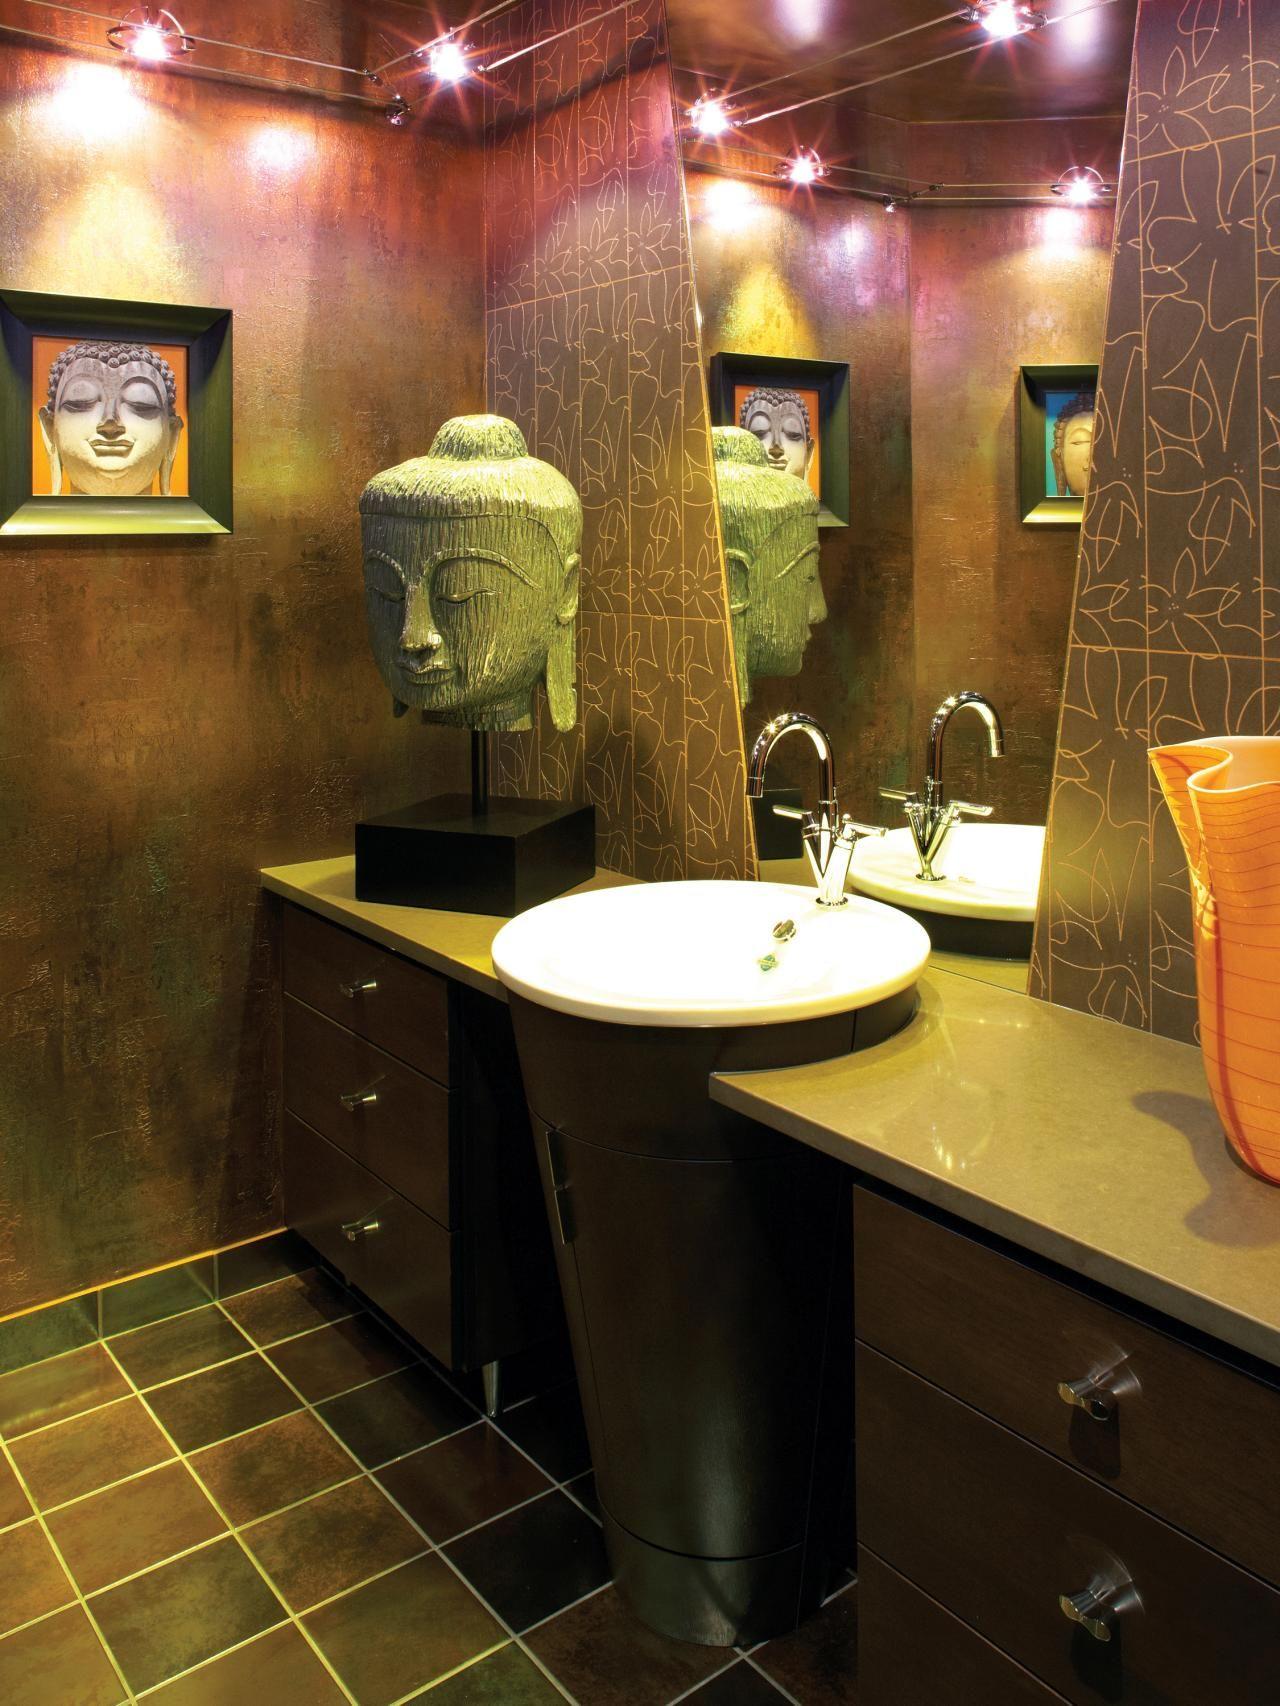 Bathroom Designs 2012 Amusing Bathroom Designs From Nkba 2012 Finalists  Bathroom Designs Bath Review